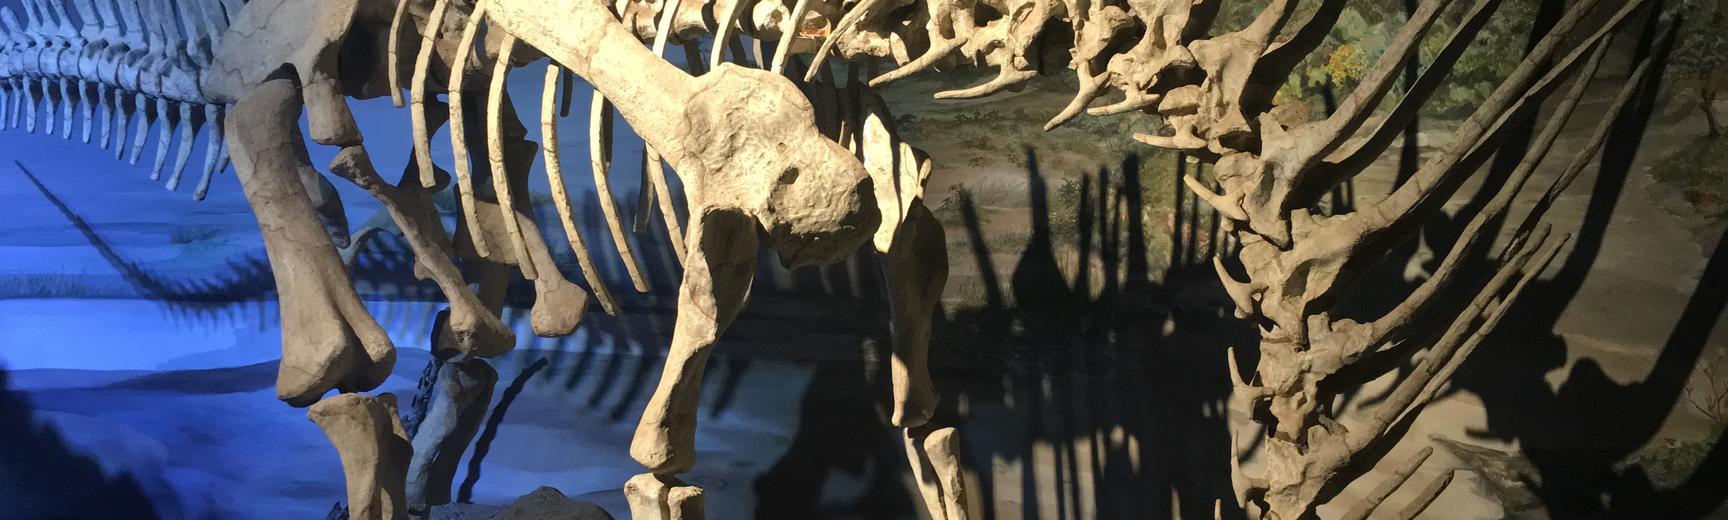 Dinosaur skeleton shown in museum